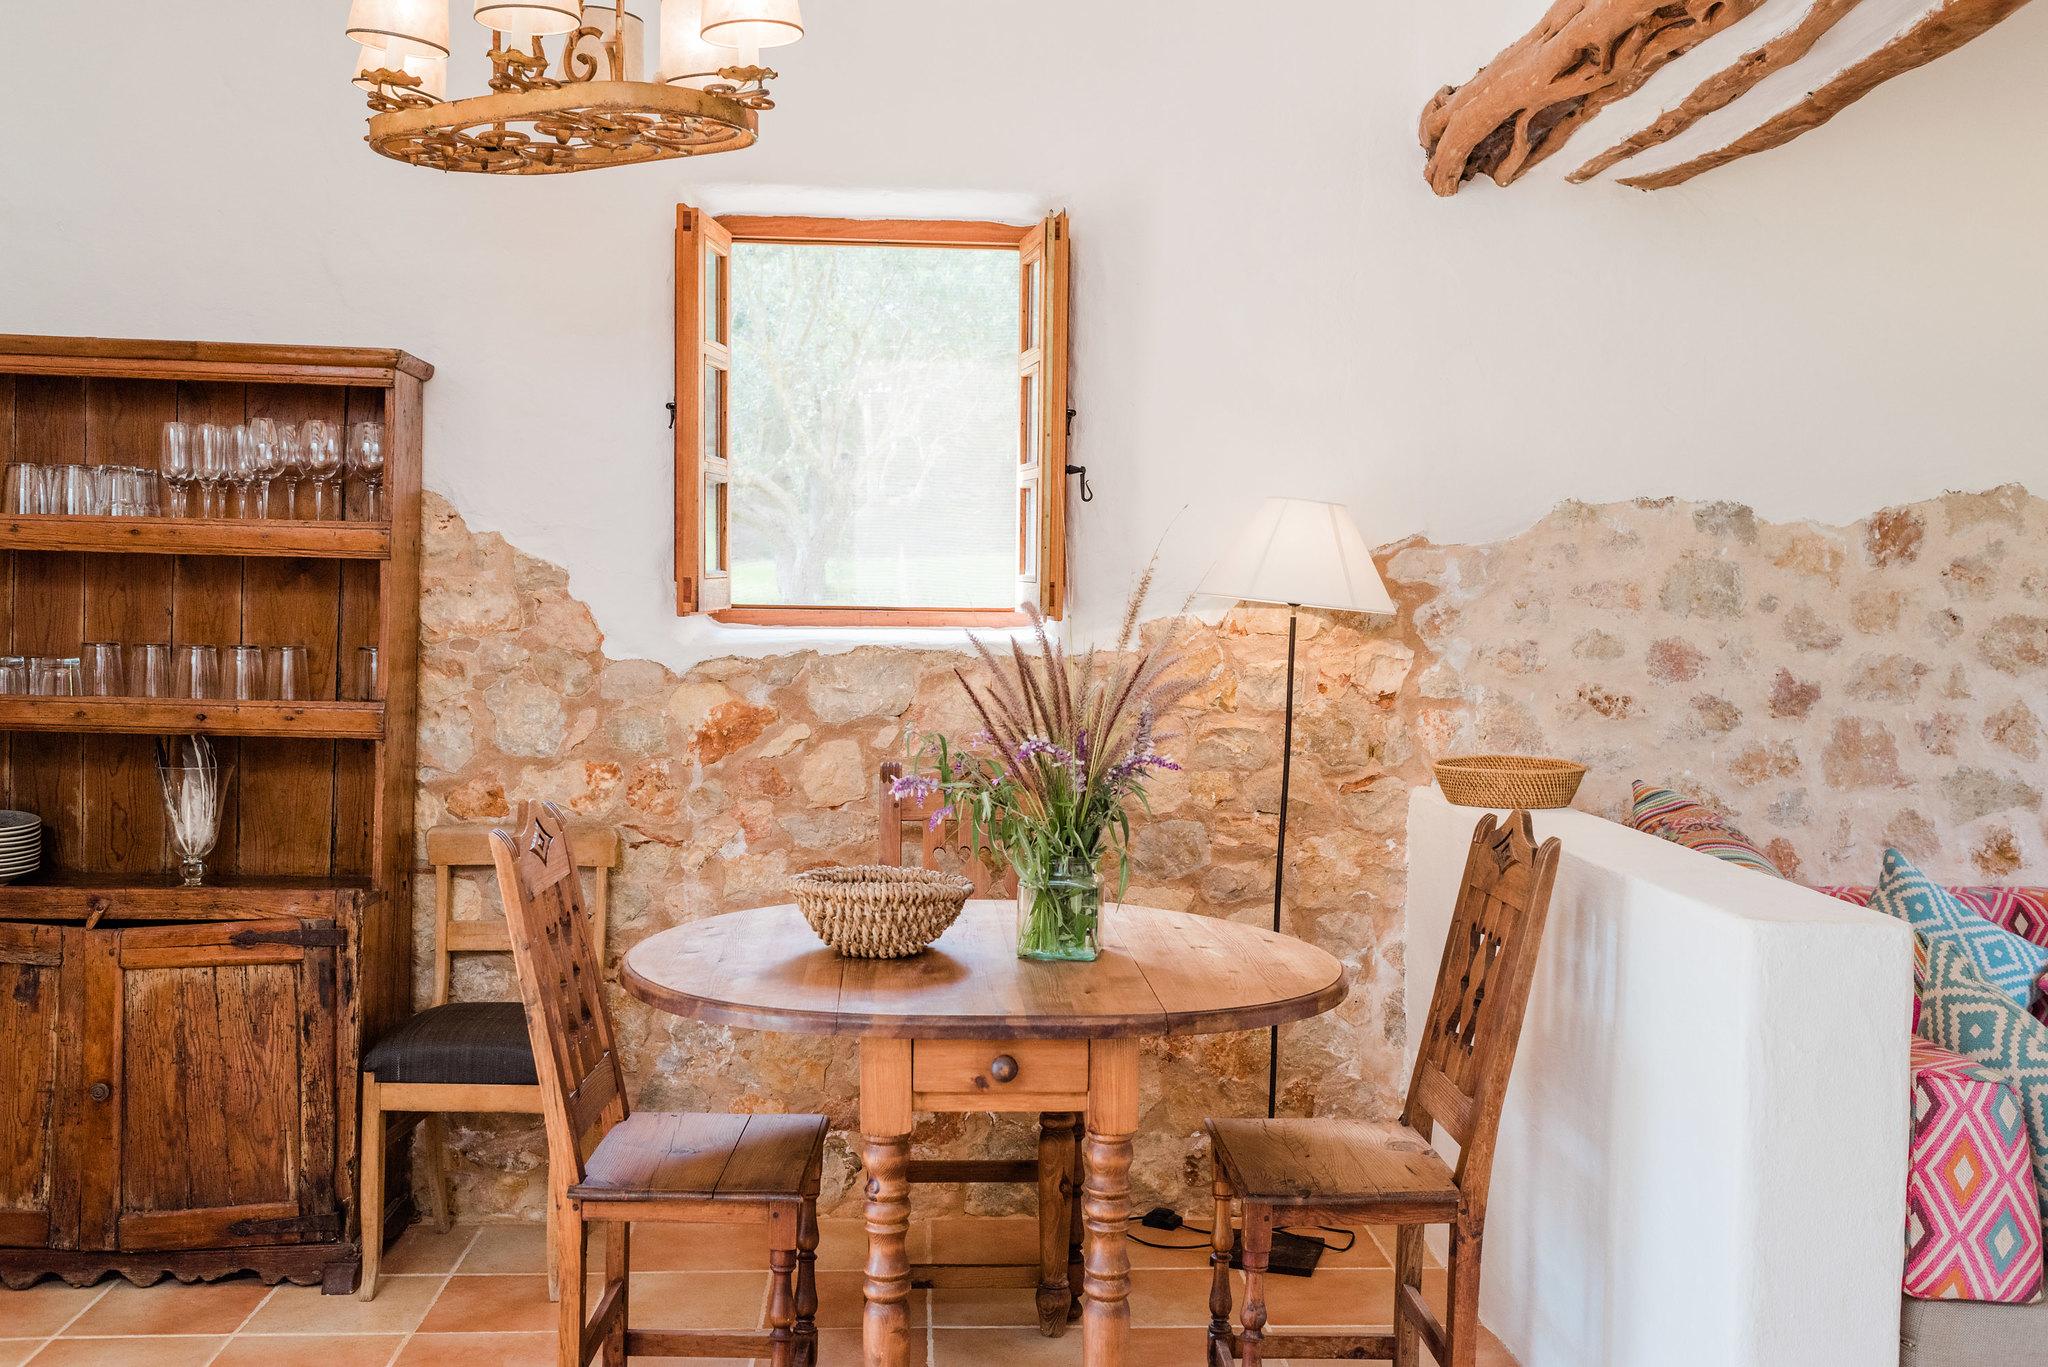 https://www.white-ibiza.com/wp-content/uploads/2020/05/white-ibiza-villas-can-sabina-interior-table.jpg